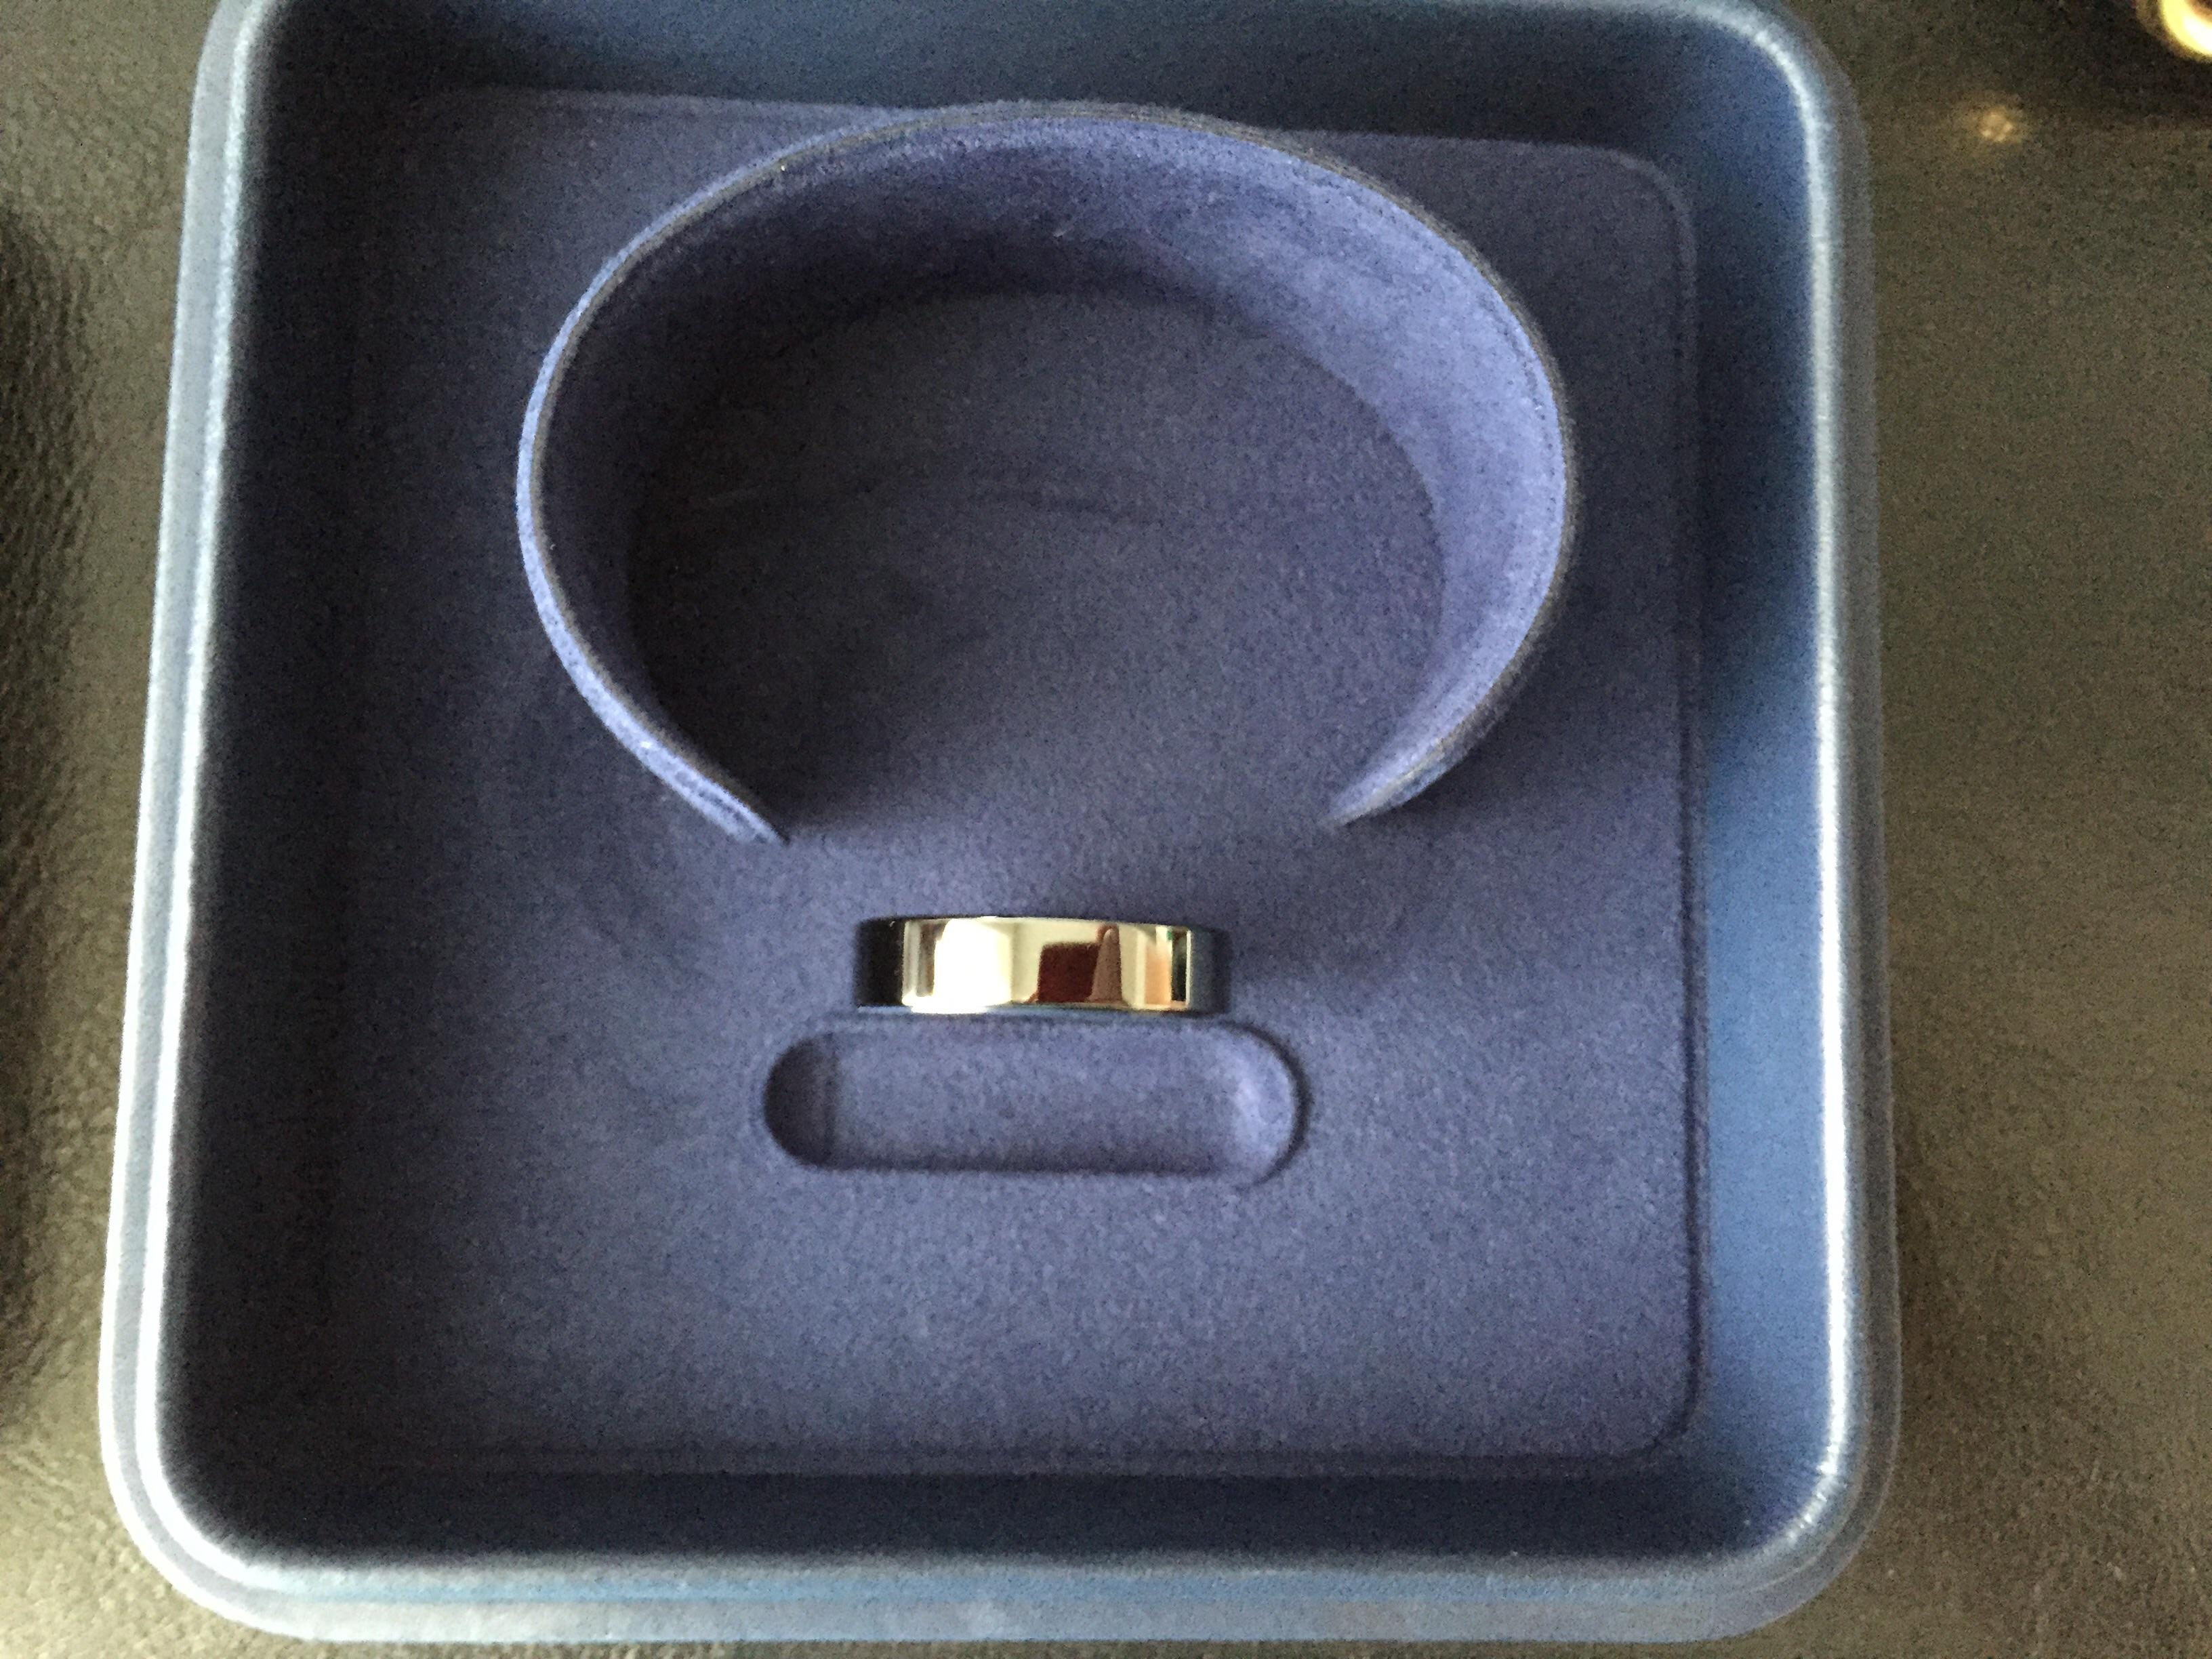 Apple Watch din aur livrare 1